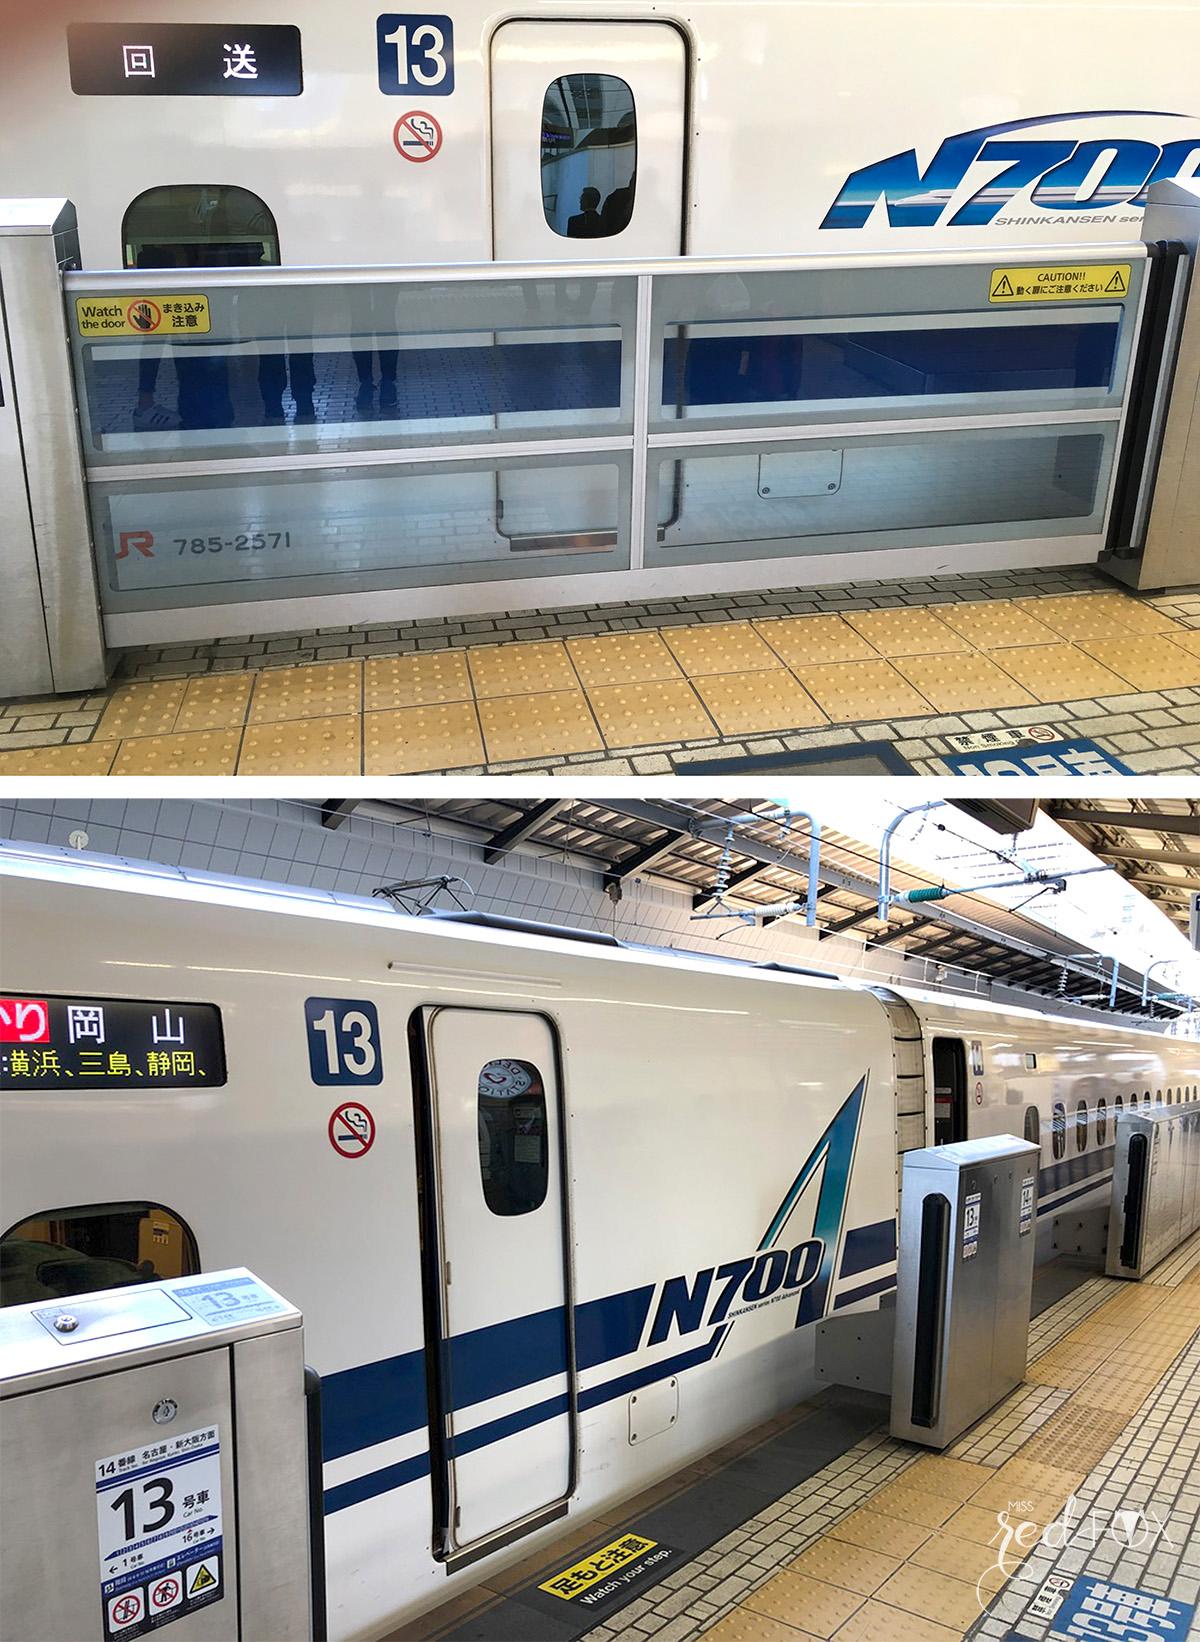 missredfox - Japan - Fuji - 03